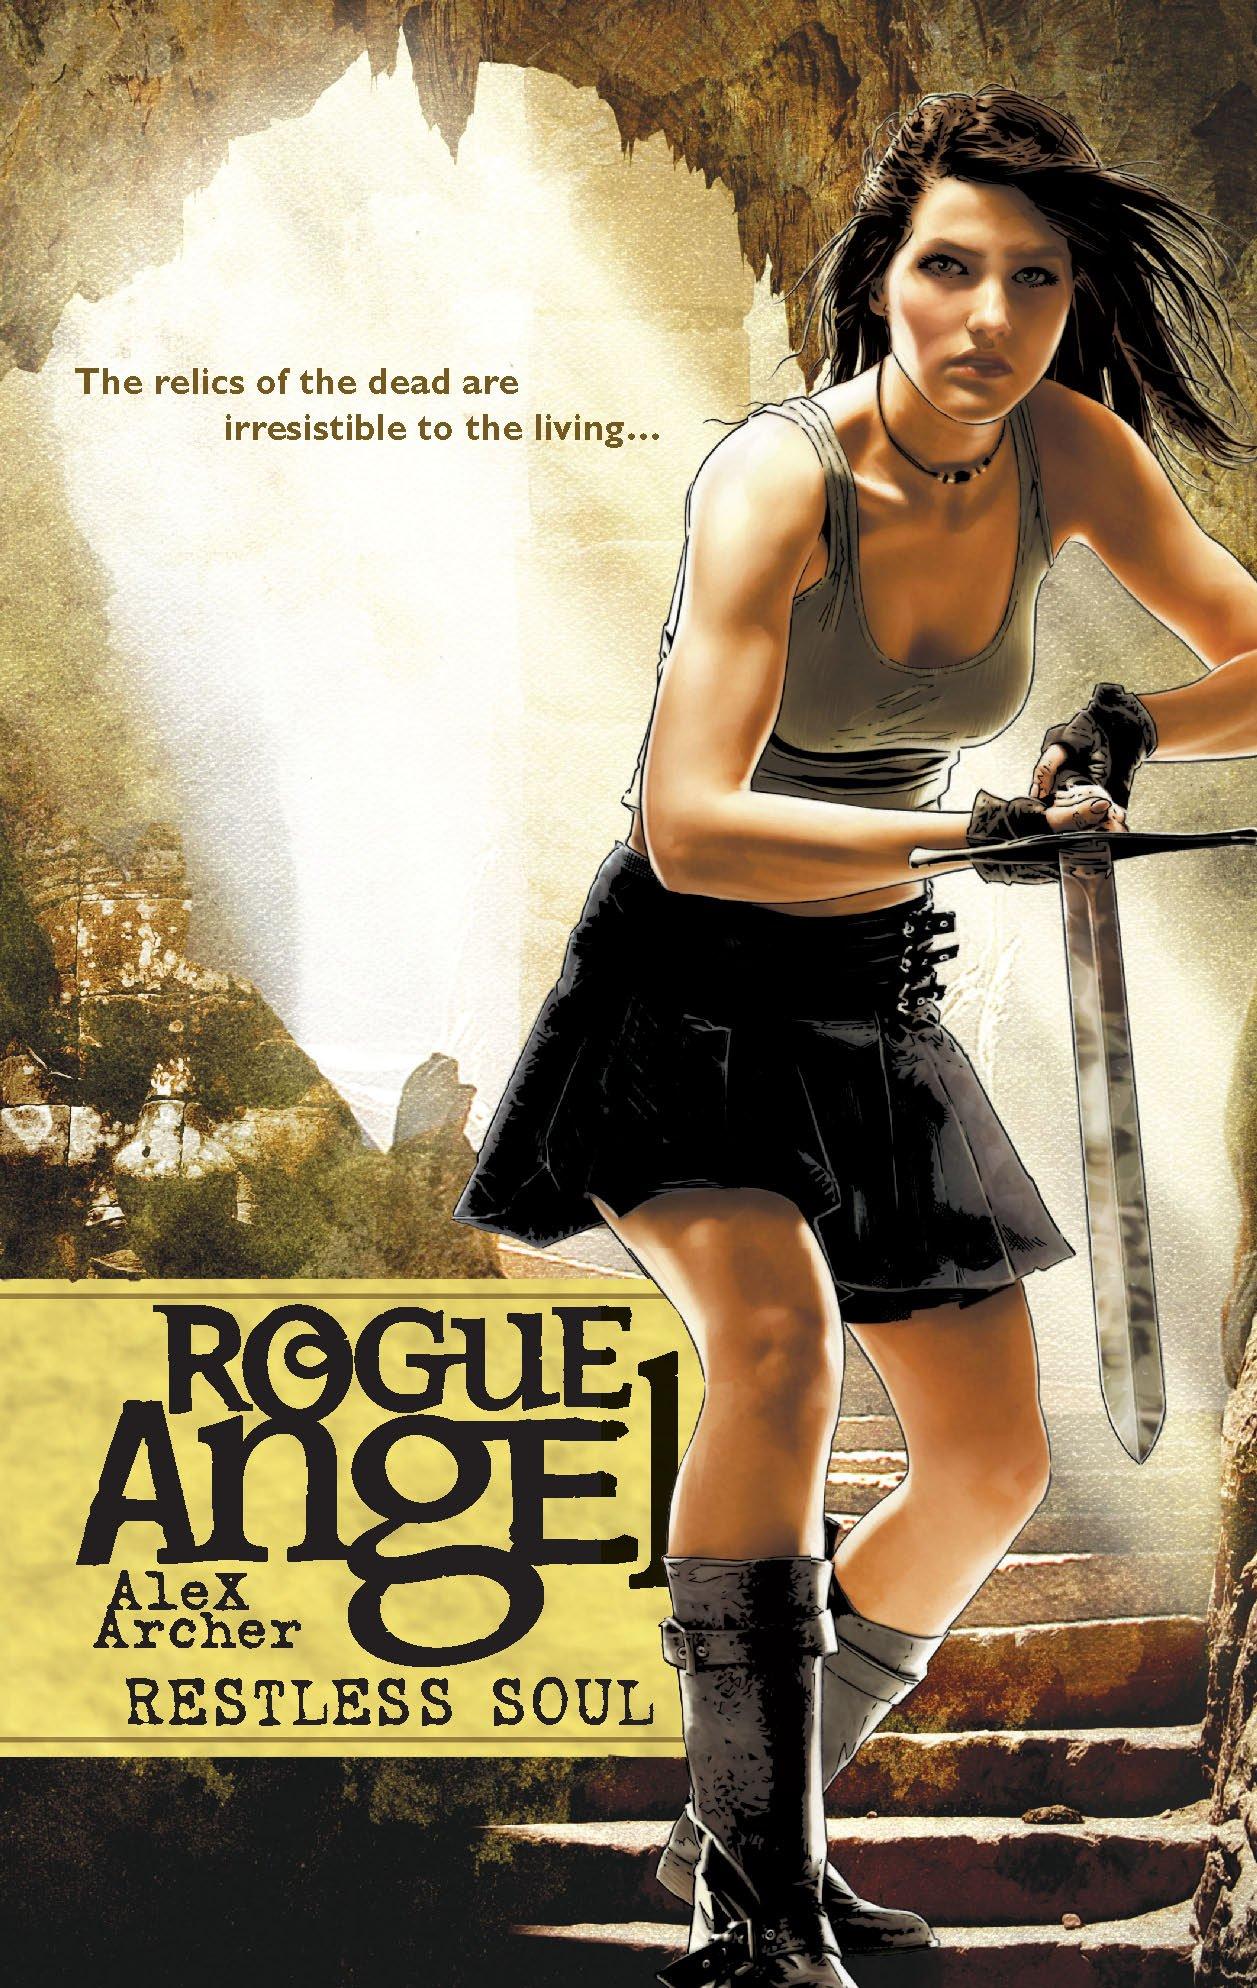 Amazon.com: Restless Soul (Rogue Angel) (9780373621477): Alex Archer: Books